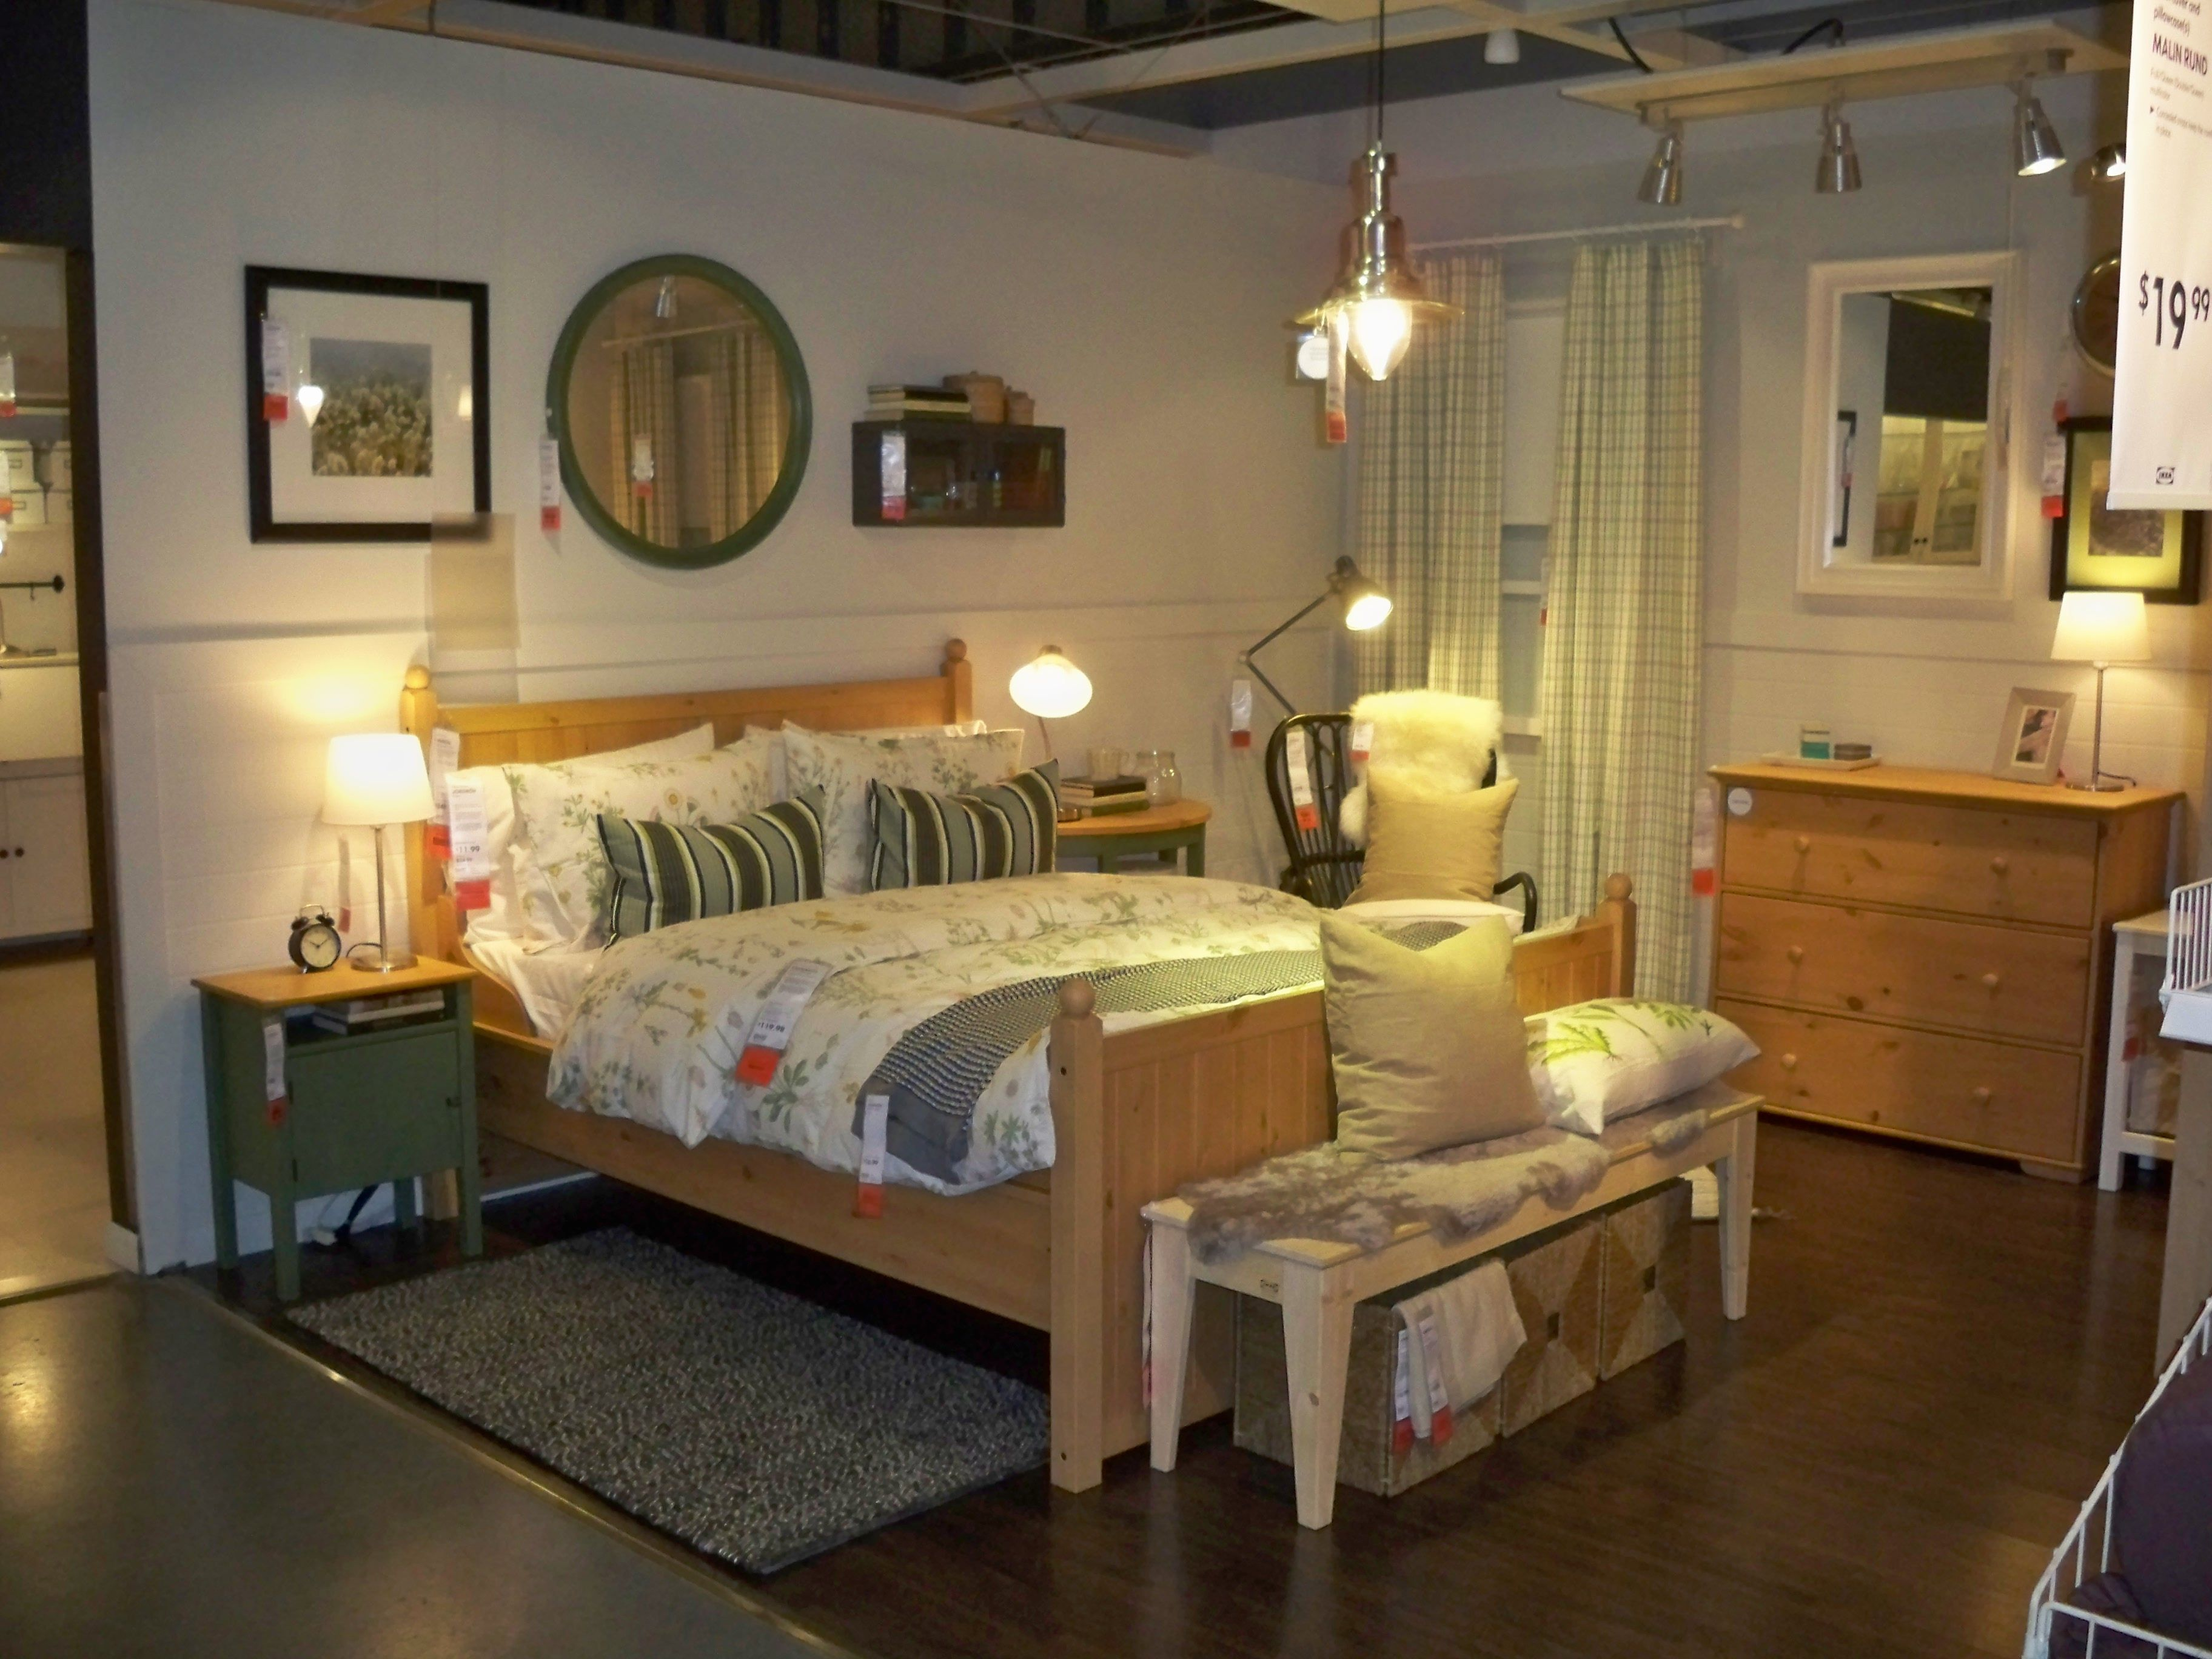 hurdal swedish country i love the room set up so cozy needs more black though bedroom. Black Bedroom Furniture Sets. Home Design Ideas